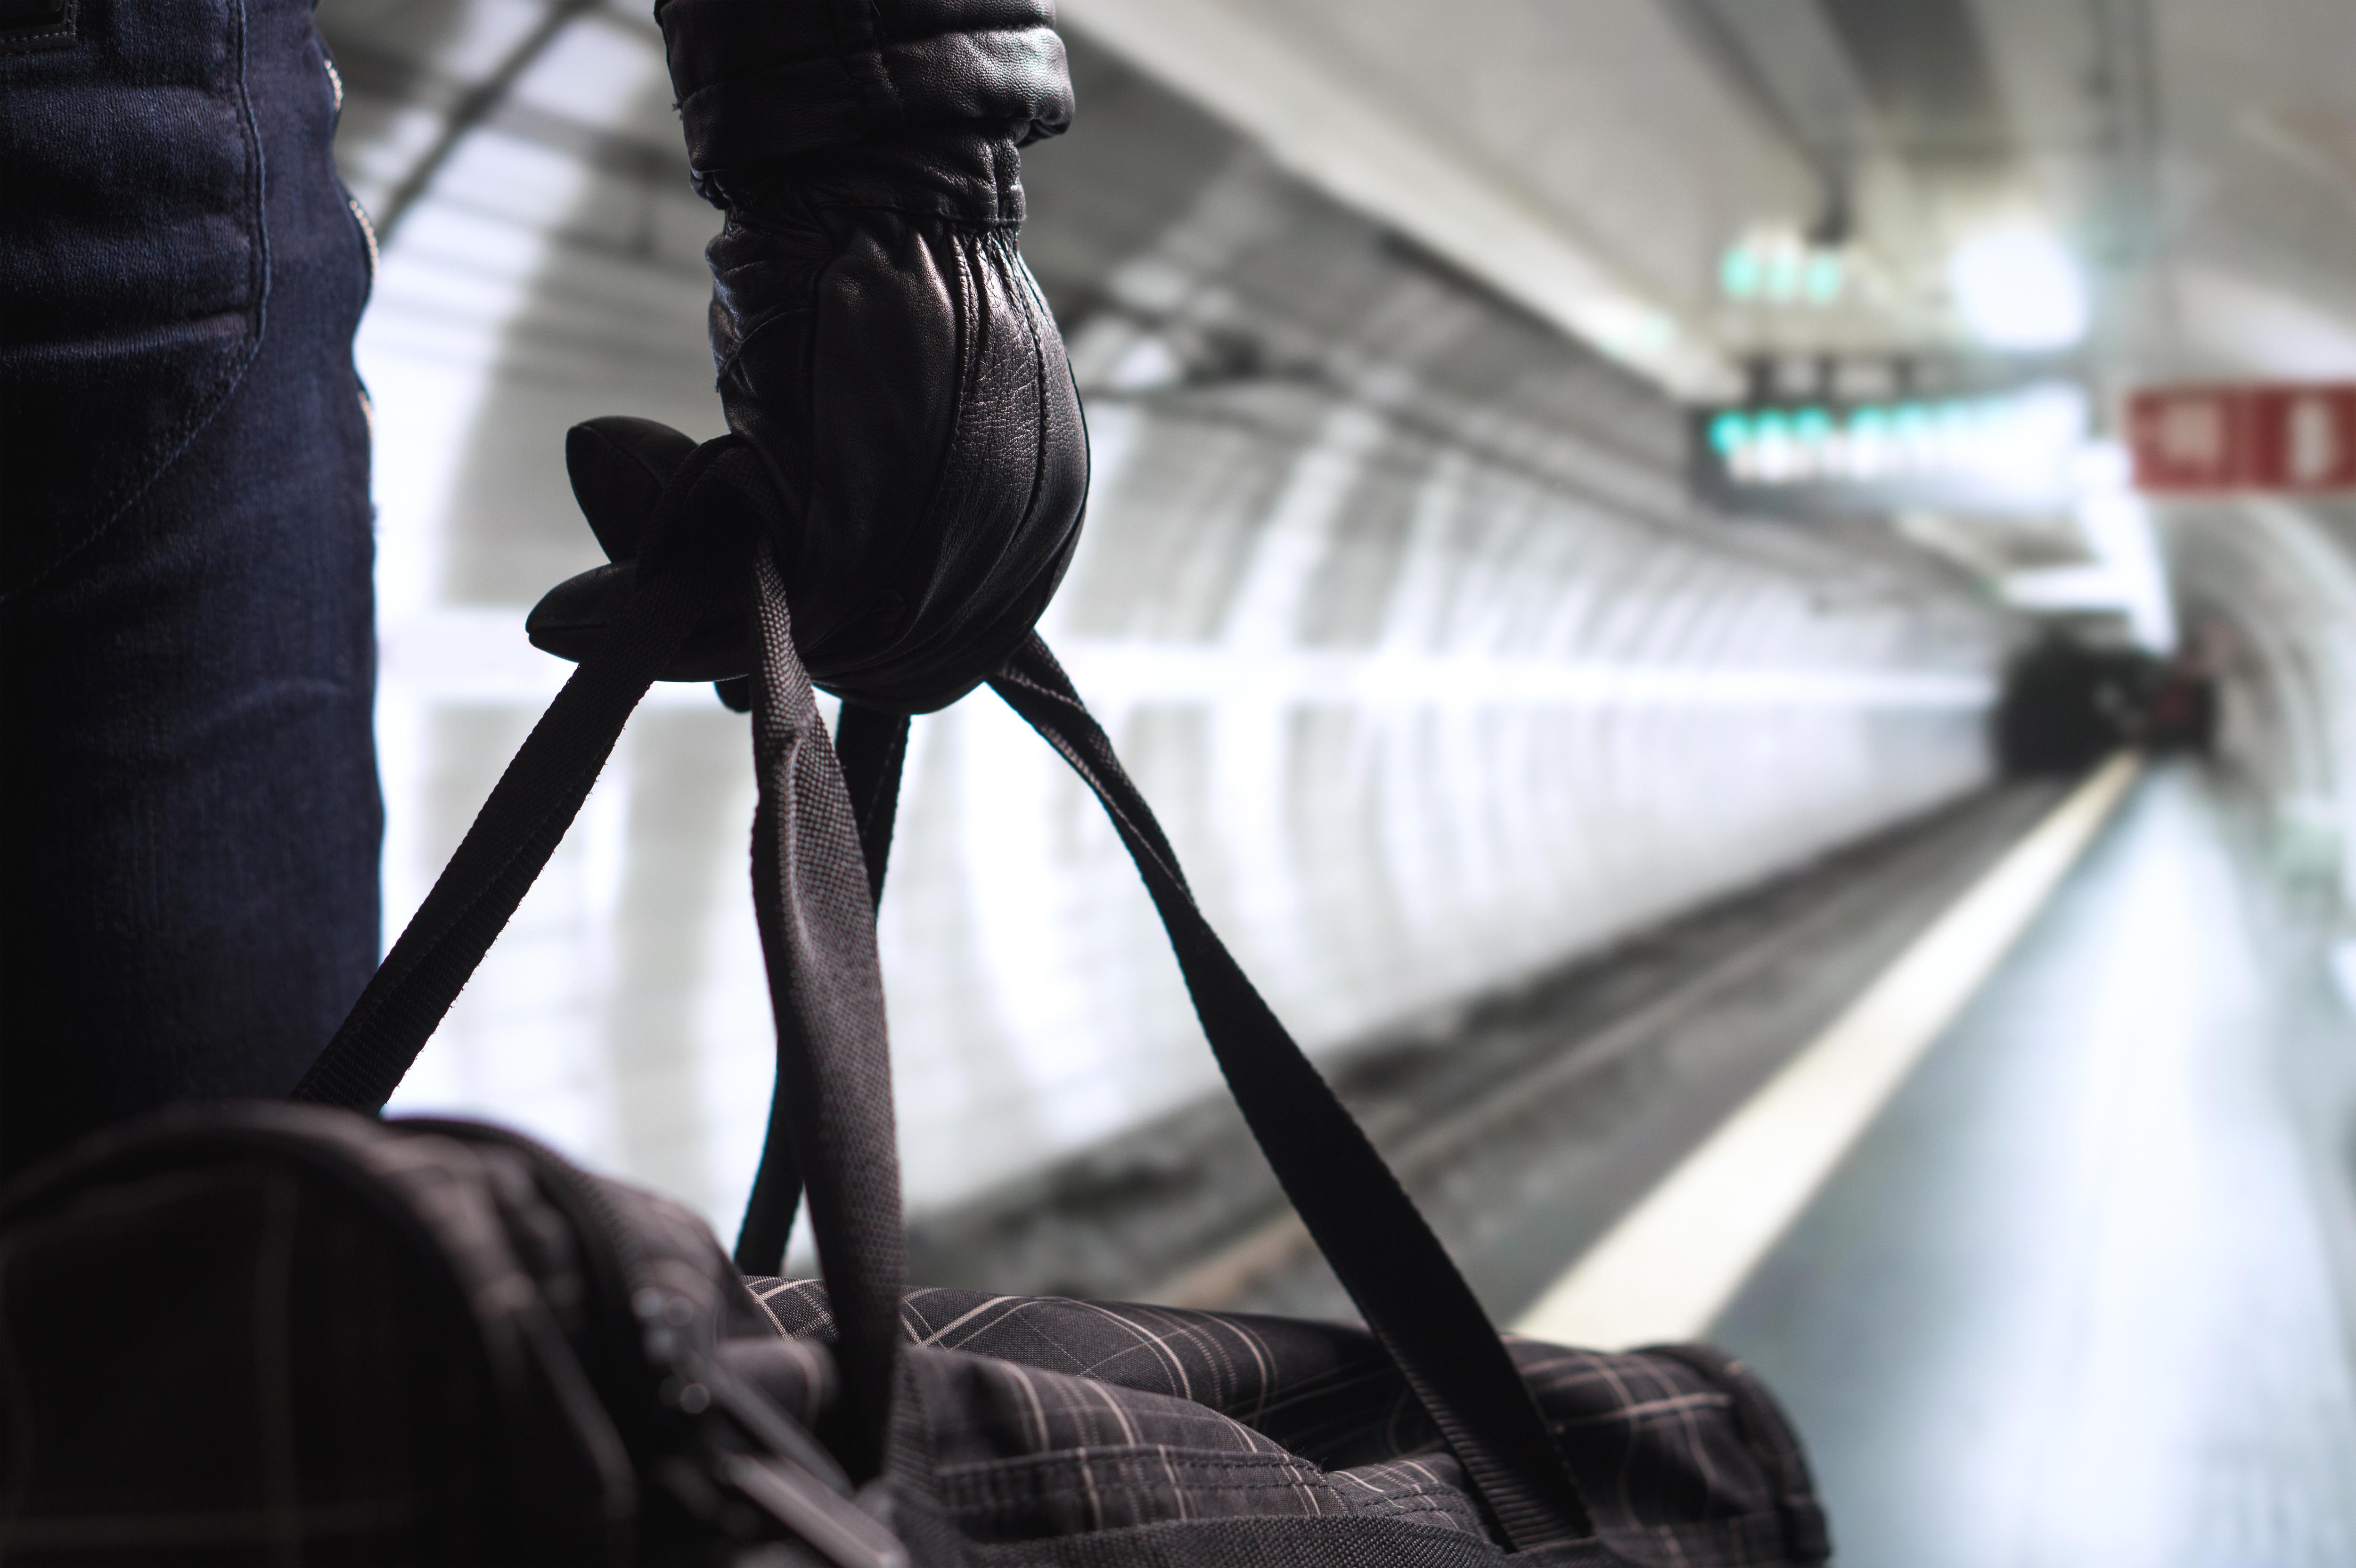 Returning Home: Evaluating Statelessness among Former Jihadists